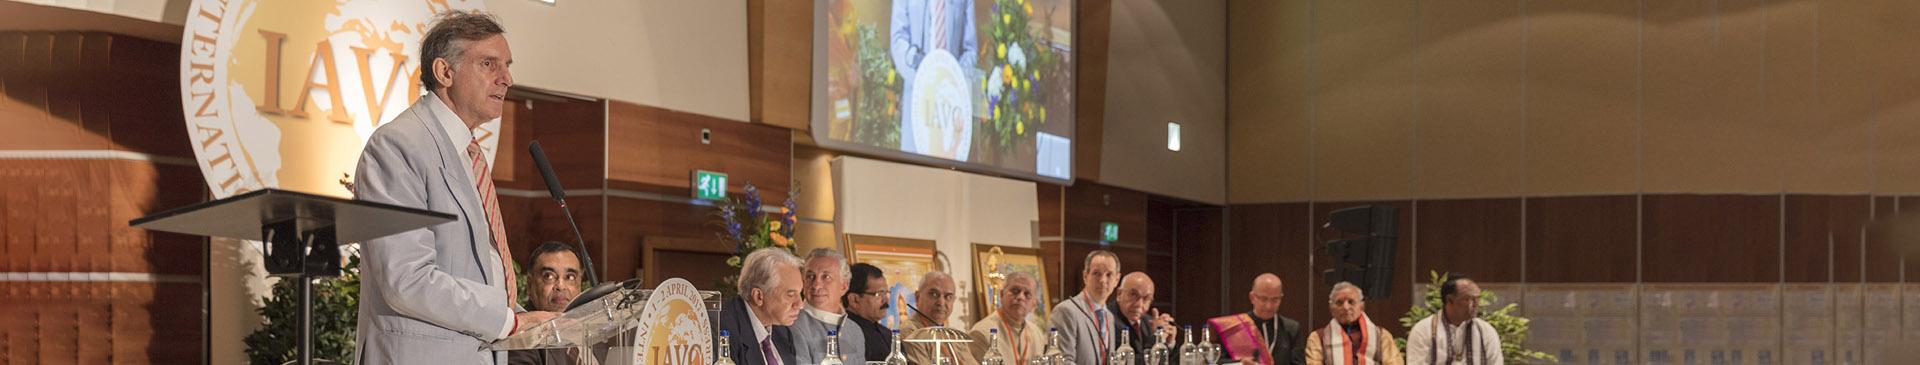 Internationaal Ayurveda Congres - 1 en 2 september, Leiden, Nederland